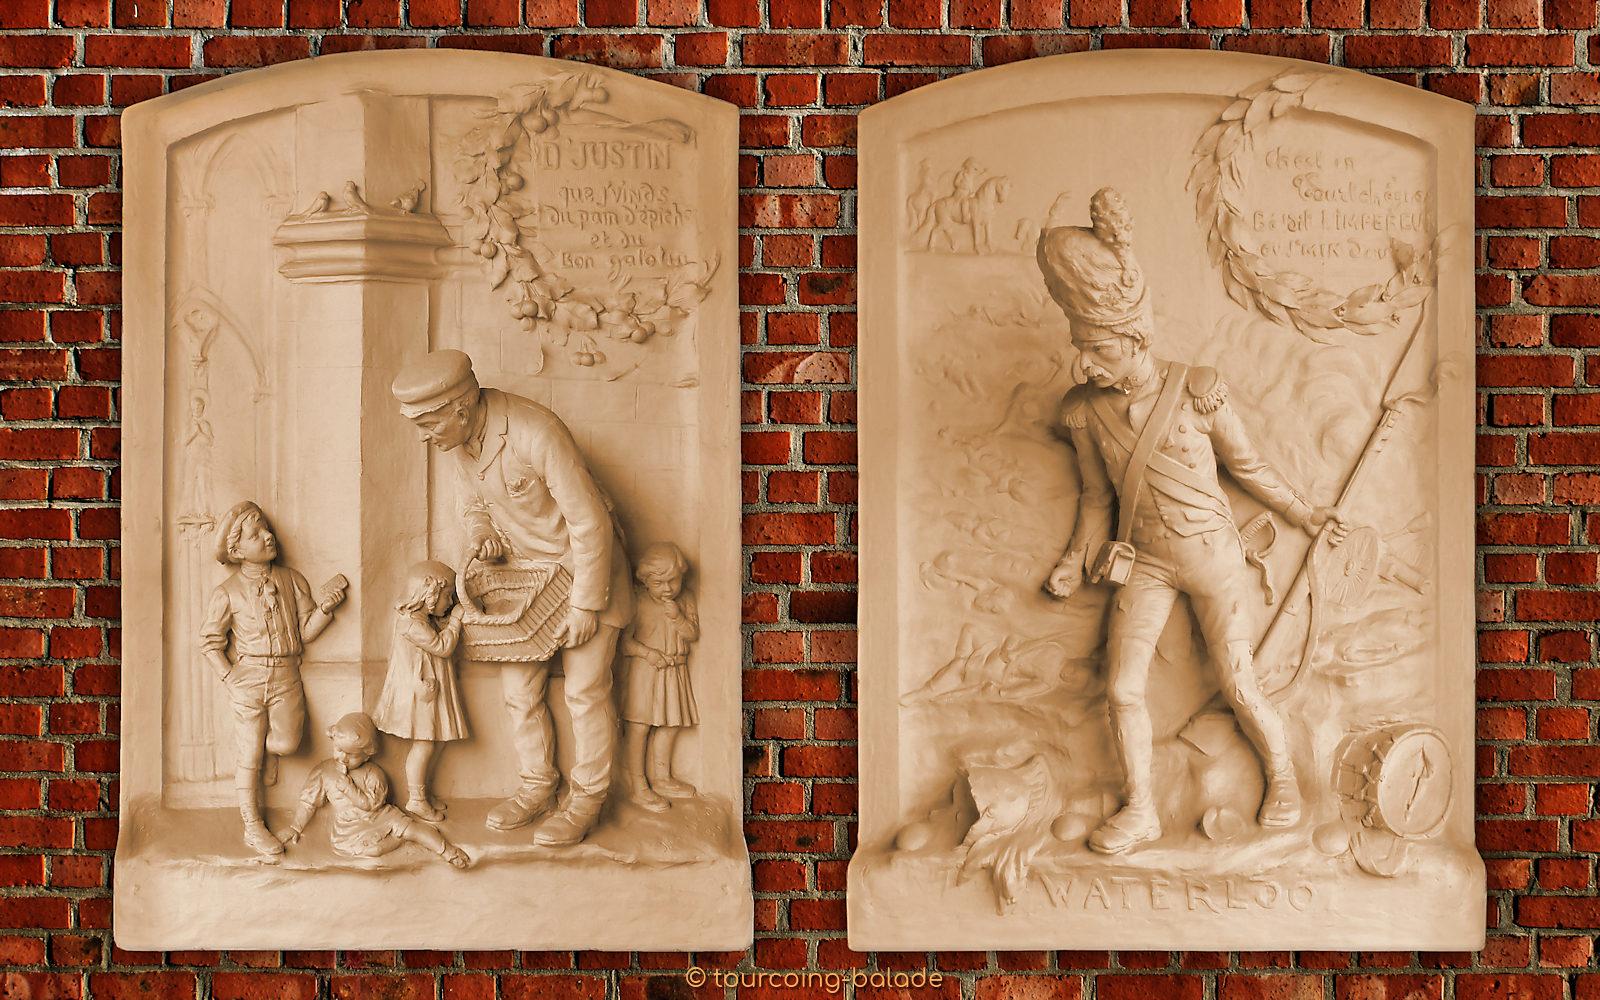 Maison du Broutteux, Watteeuw - Bas-reliefs de Jules Clamagirand